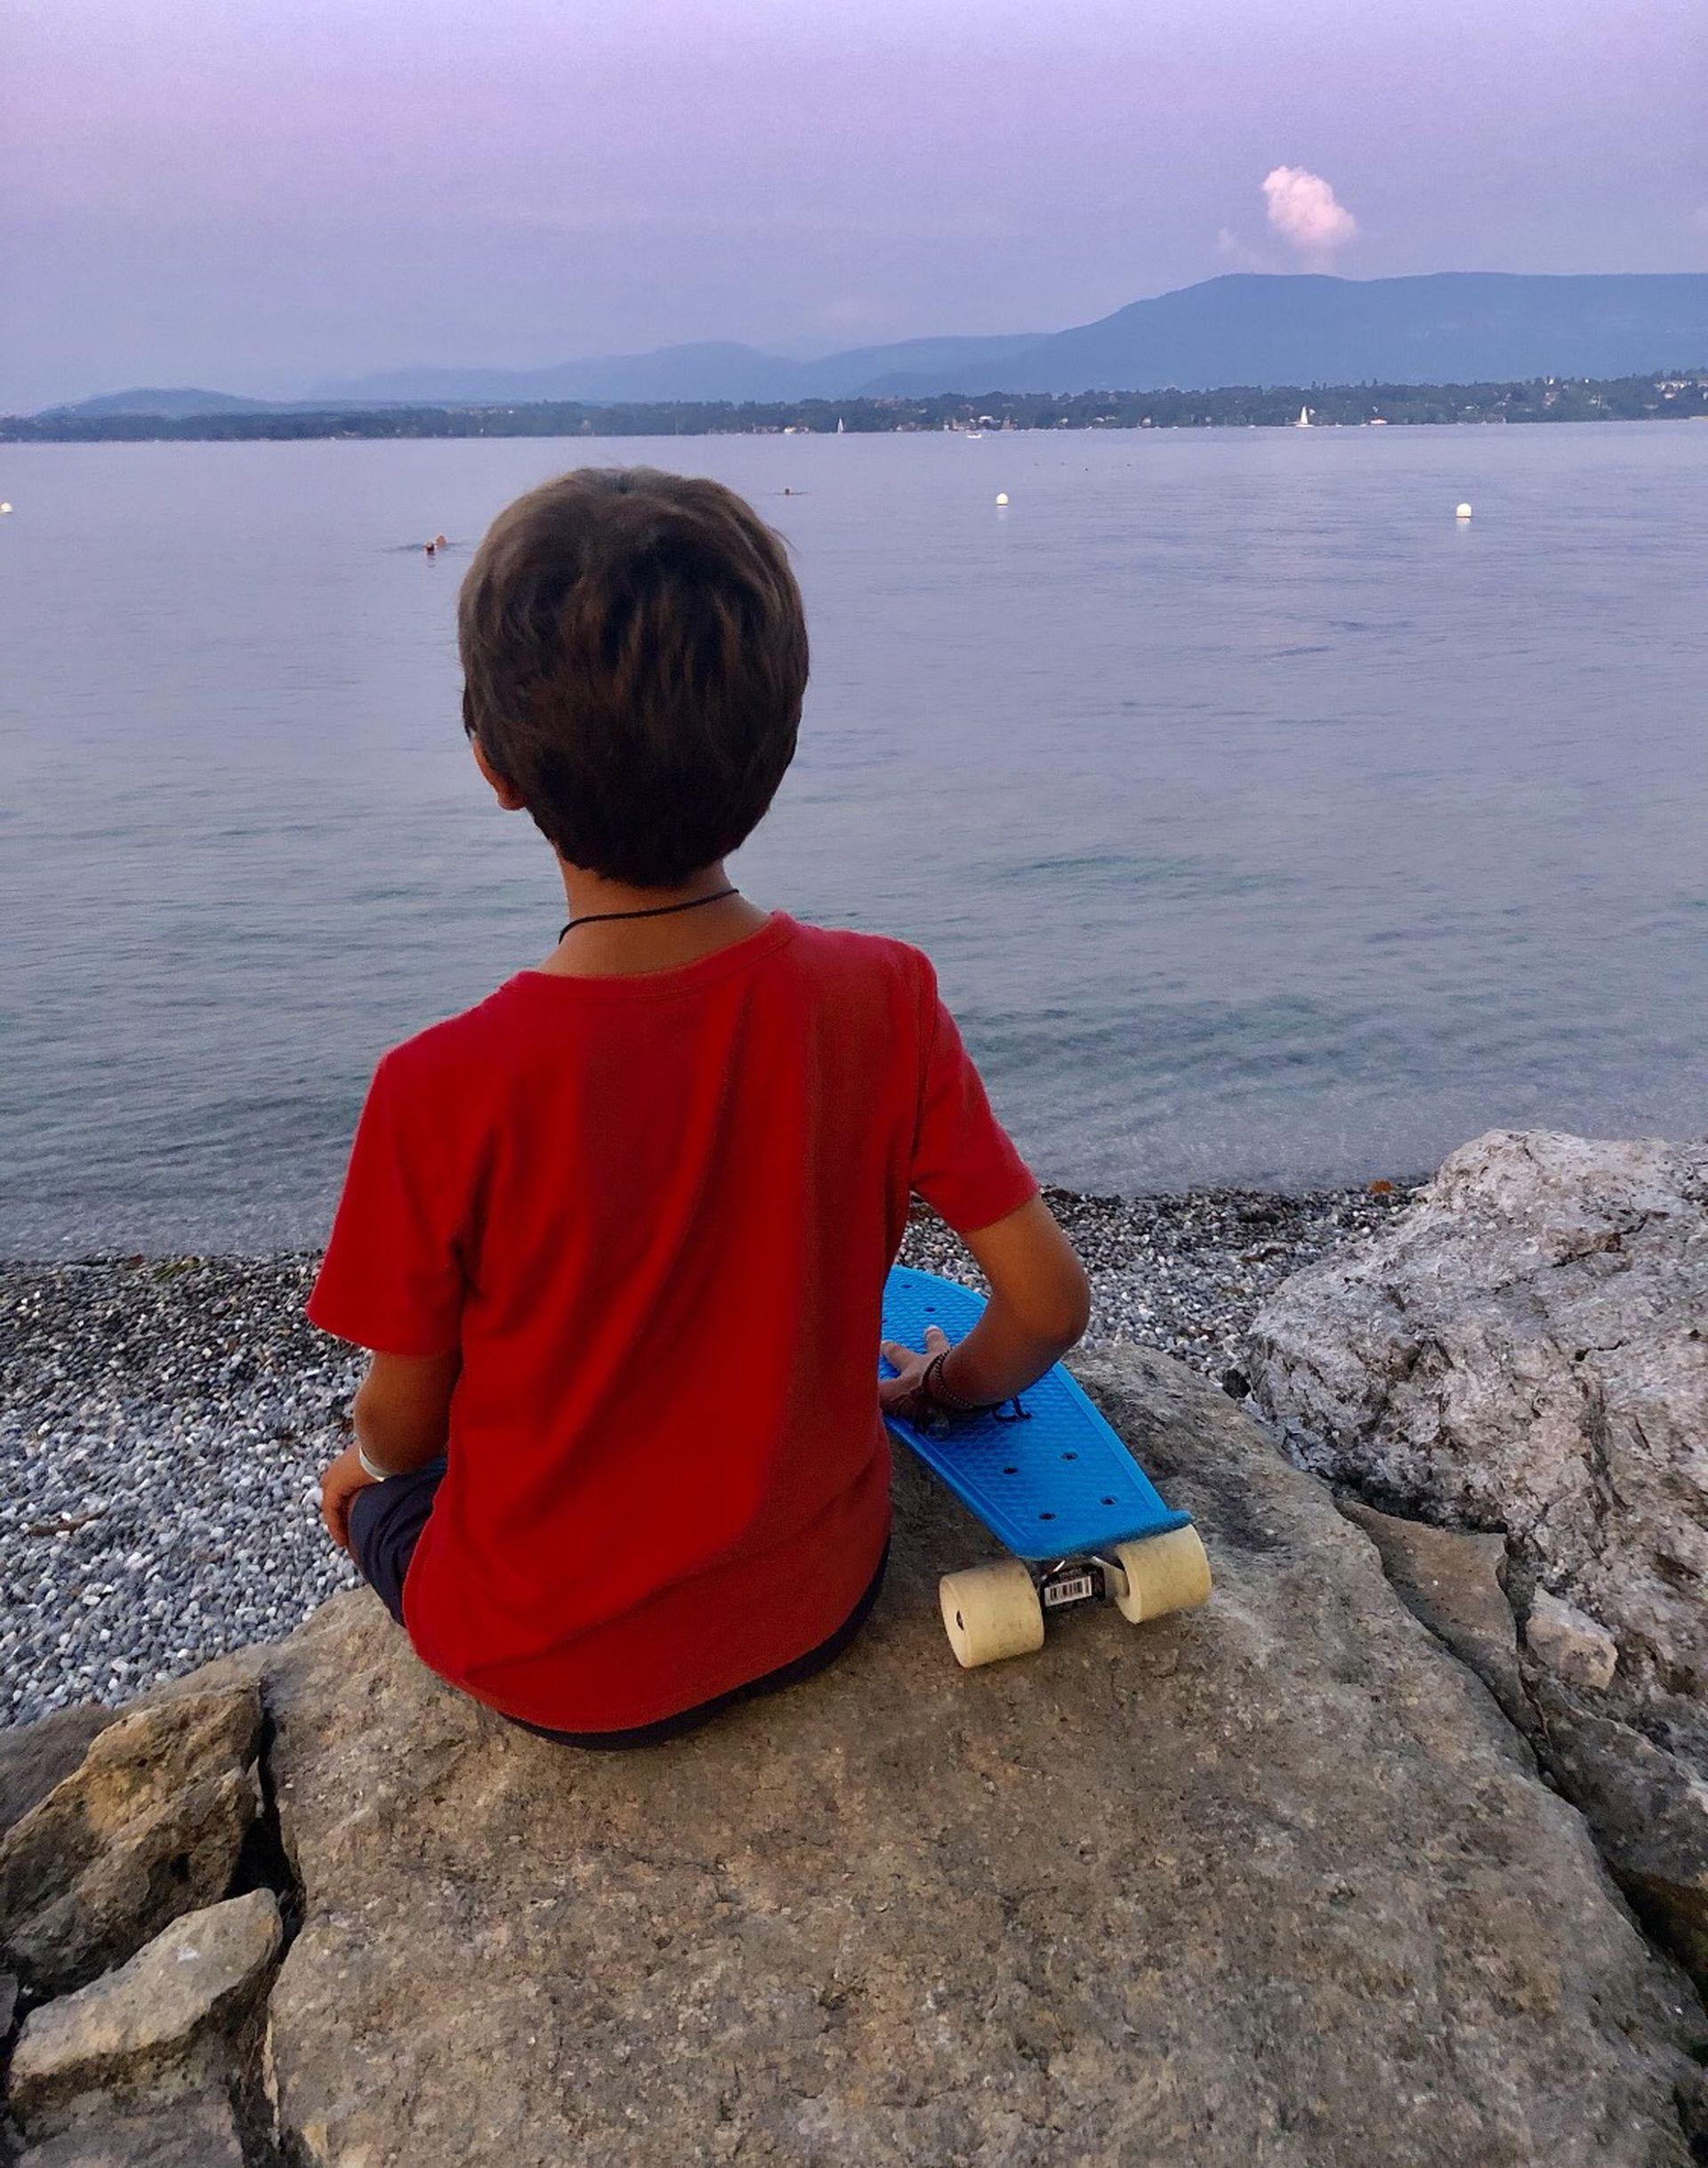 La familia disfruta a diario de la naturaleza en Ginebra.